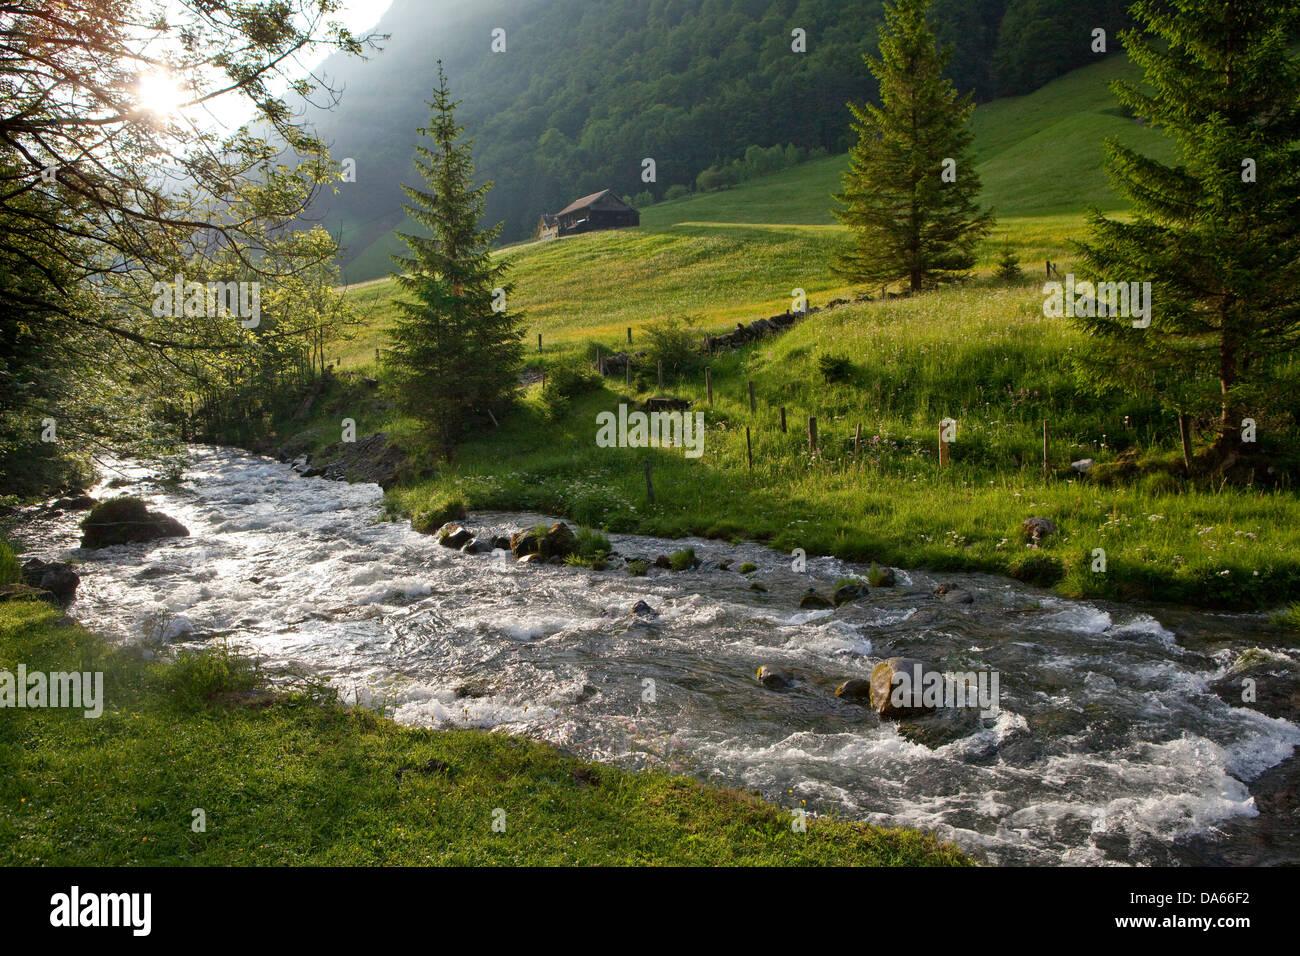 Brook Schwendi, pantanos, montañas, montañas, muelle, cantón Appenzell Innerroden, Appenzell, área, Imagen De Stock